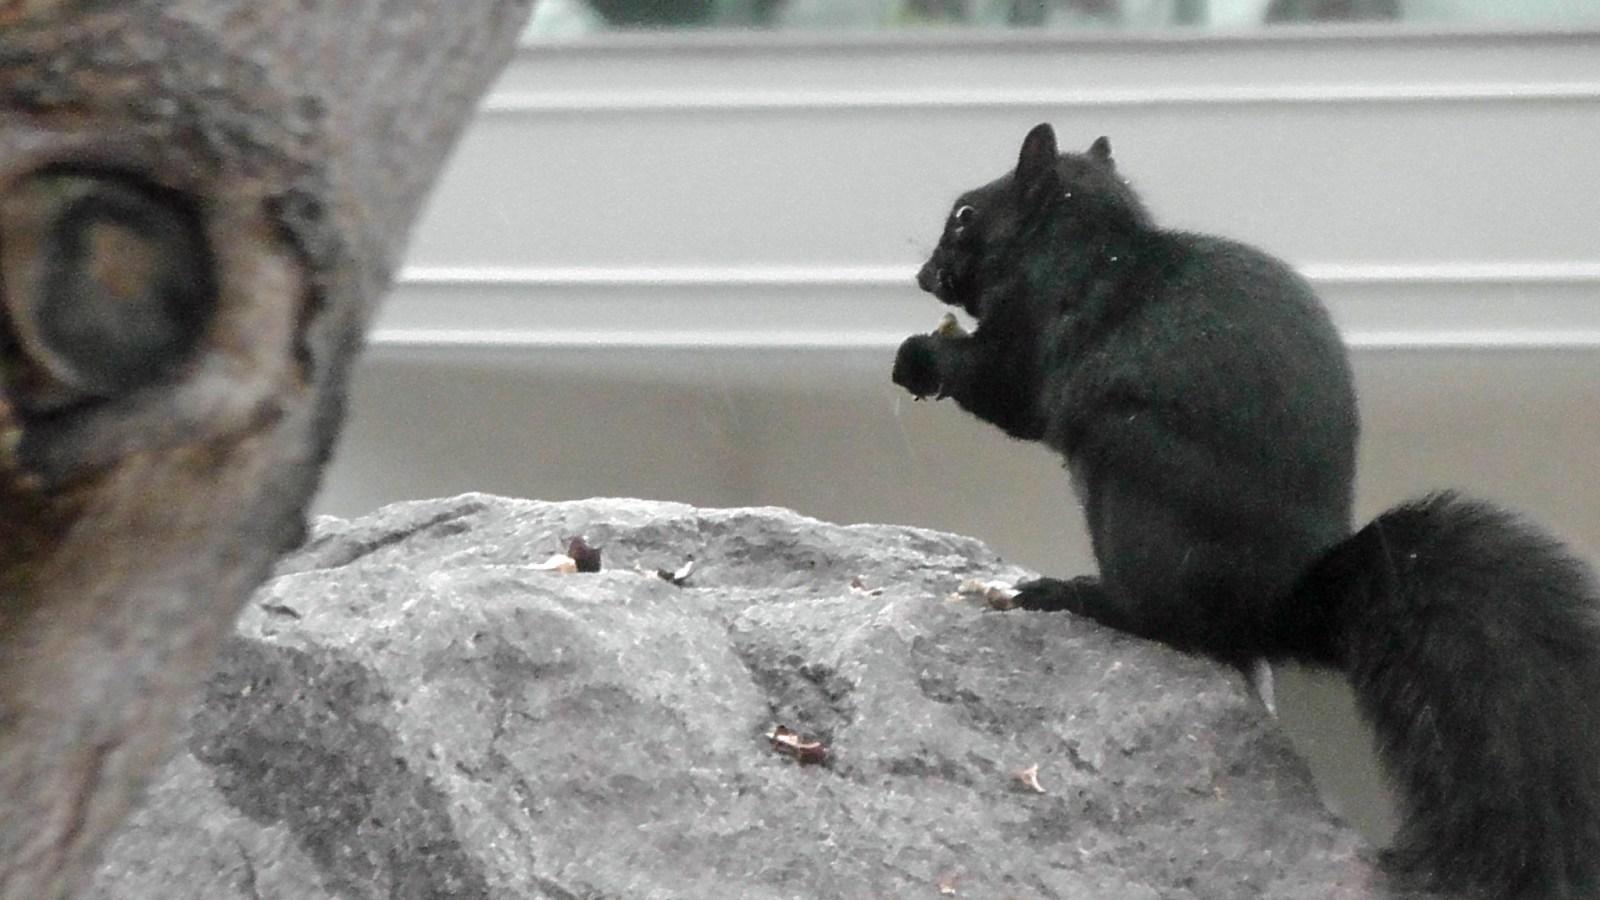 EG Shines - Squirrel